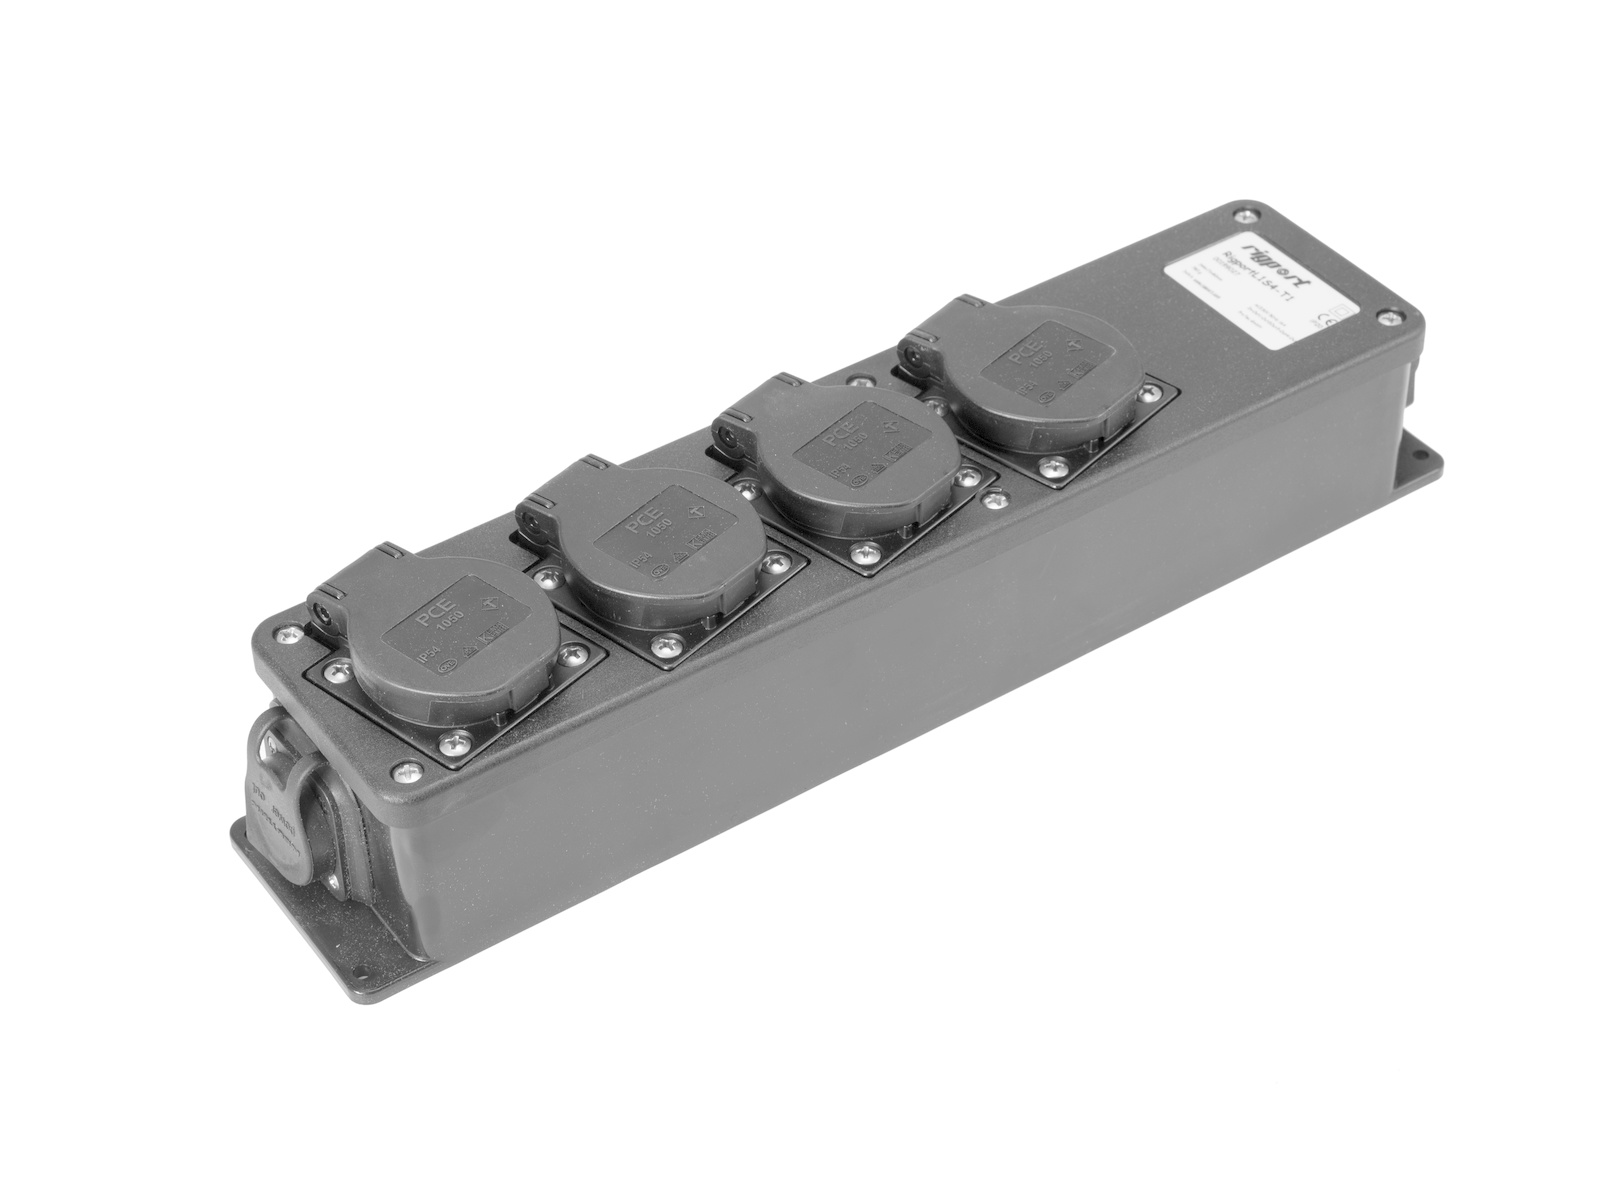 RIGPORT RIGPORT L-1S4-T1 Power Distributor